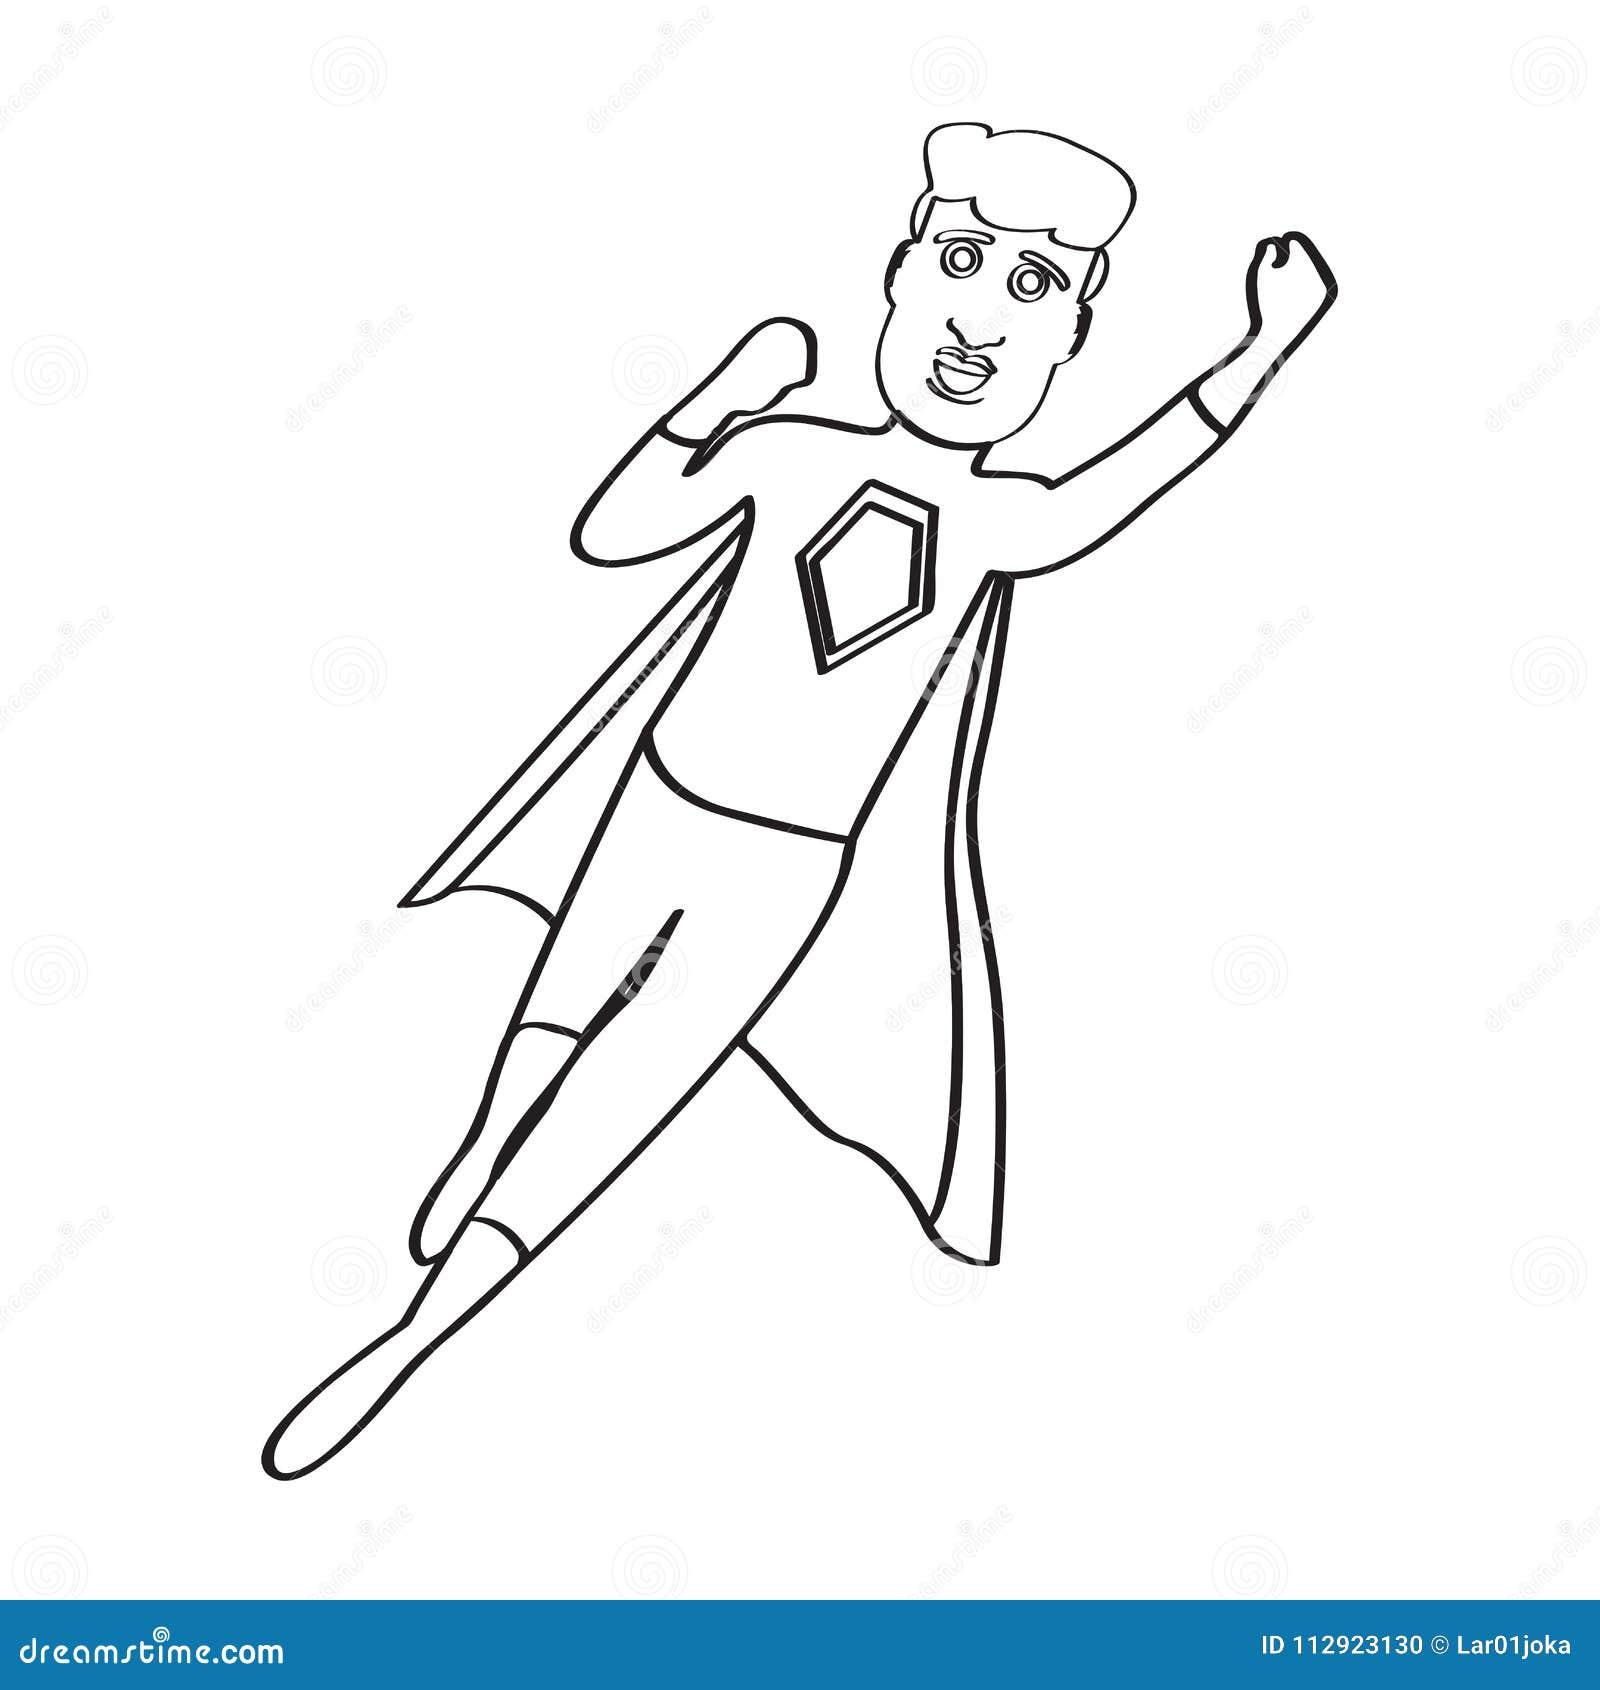 Male superhero cartoon character sketch